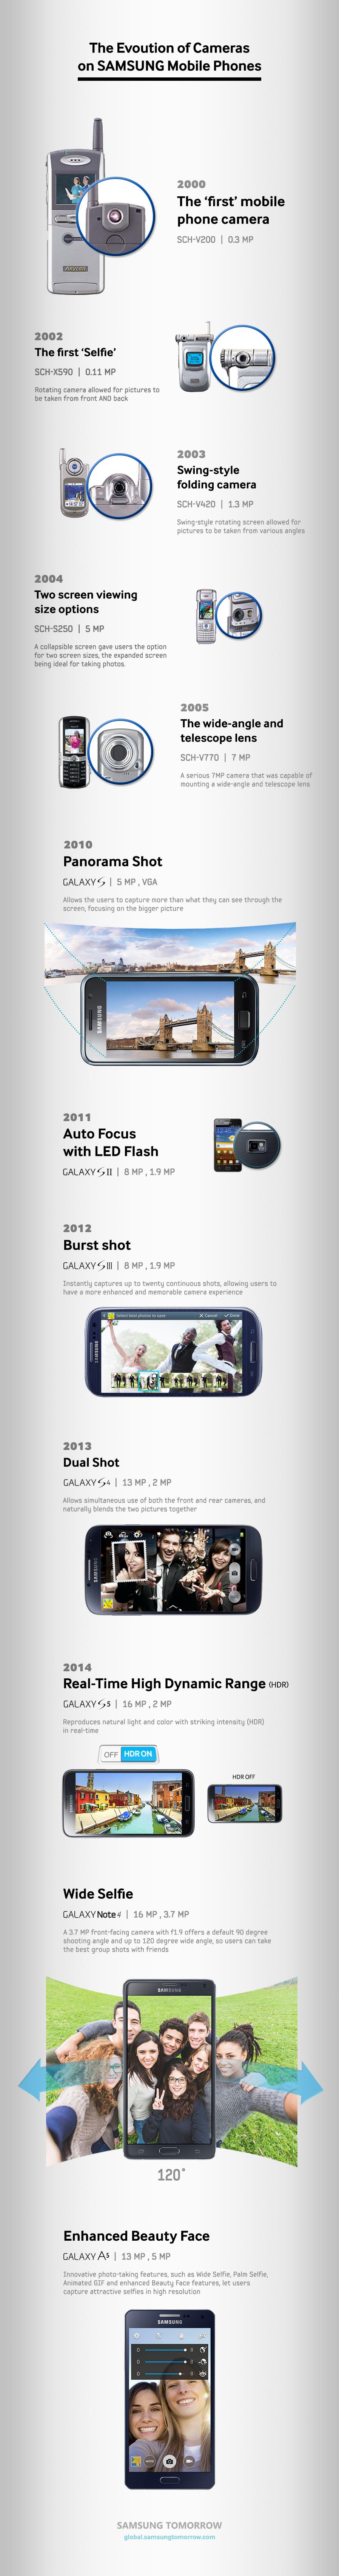 samsung_mobile-camera_infographic